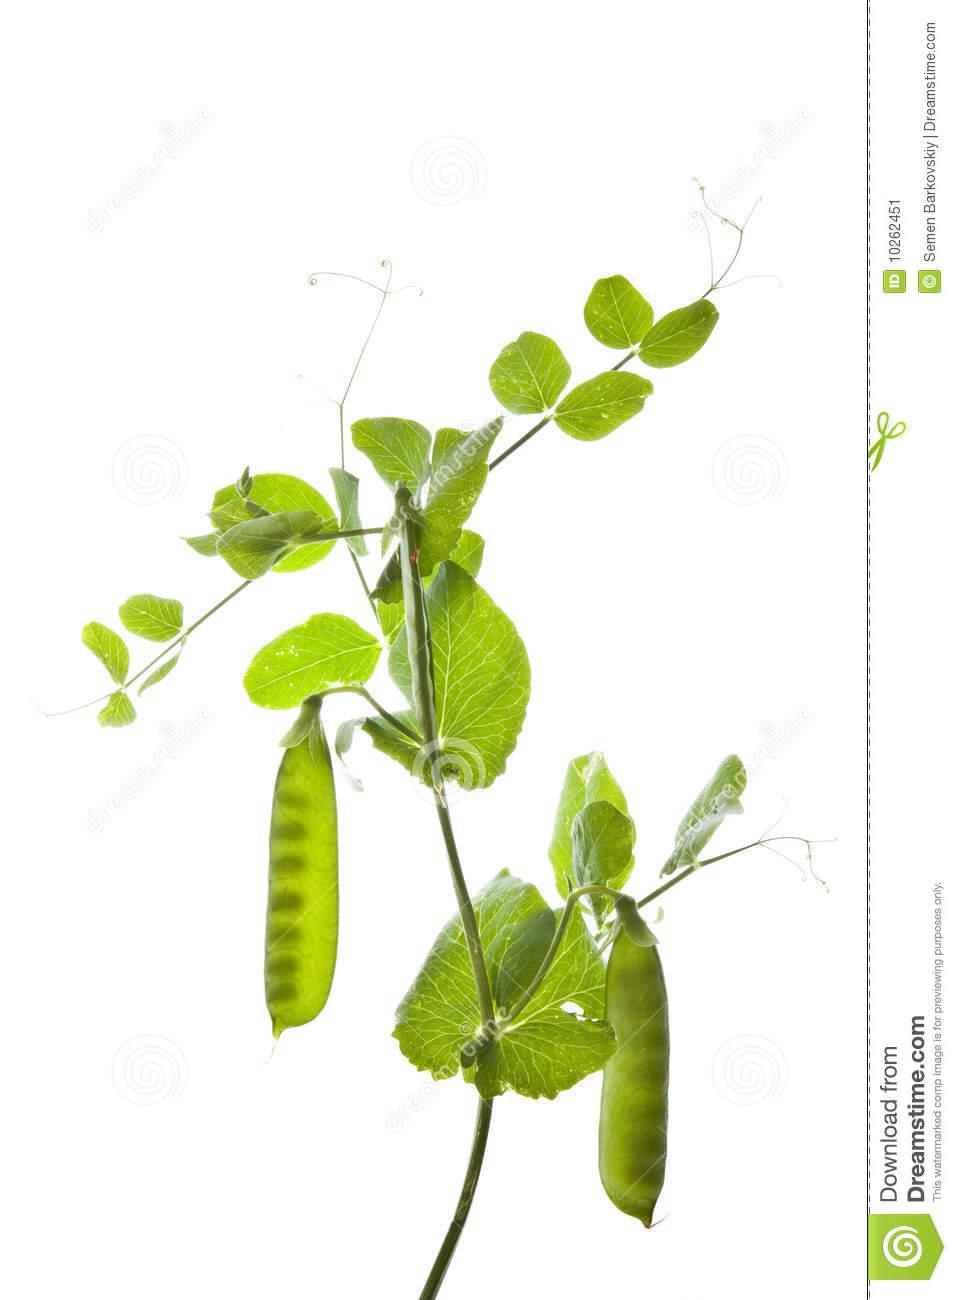 Pea Plant Stock Image Image 10262451 URDc6U Clipart on Preschool Storytime